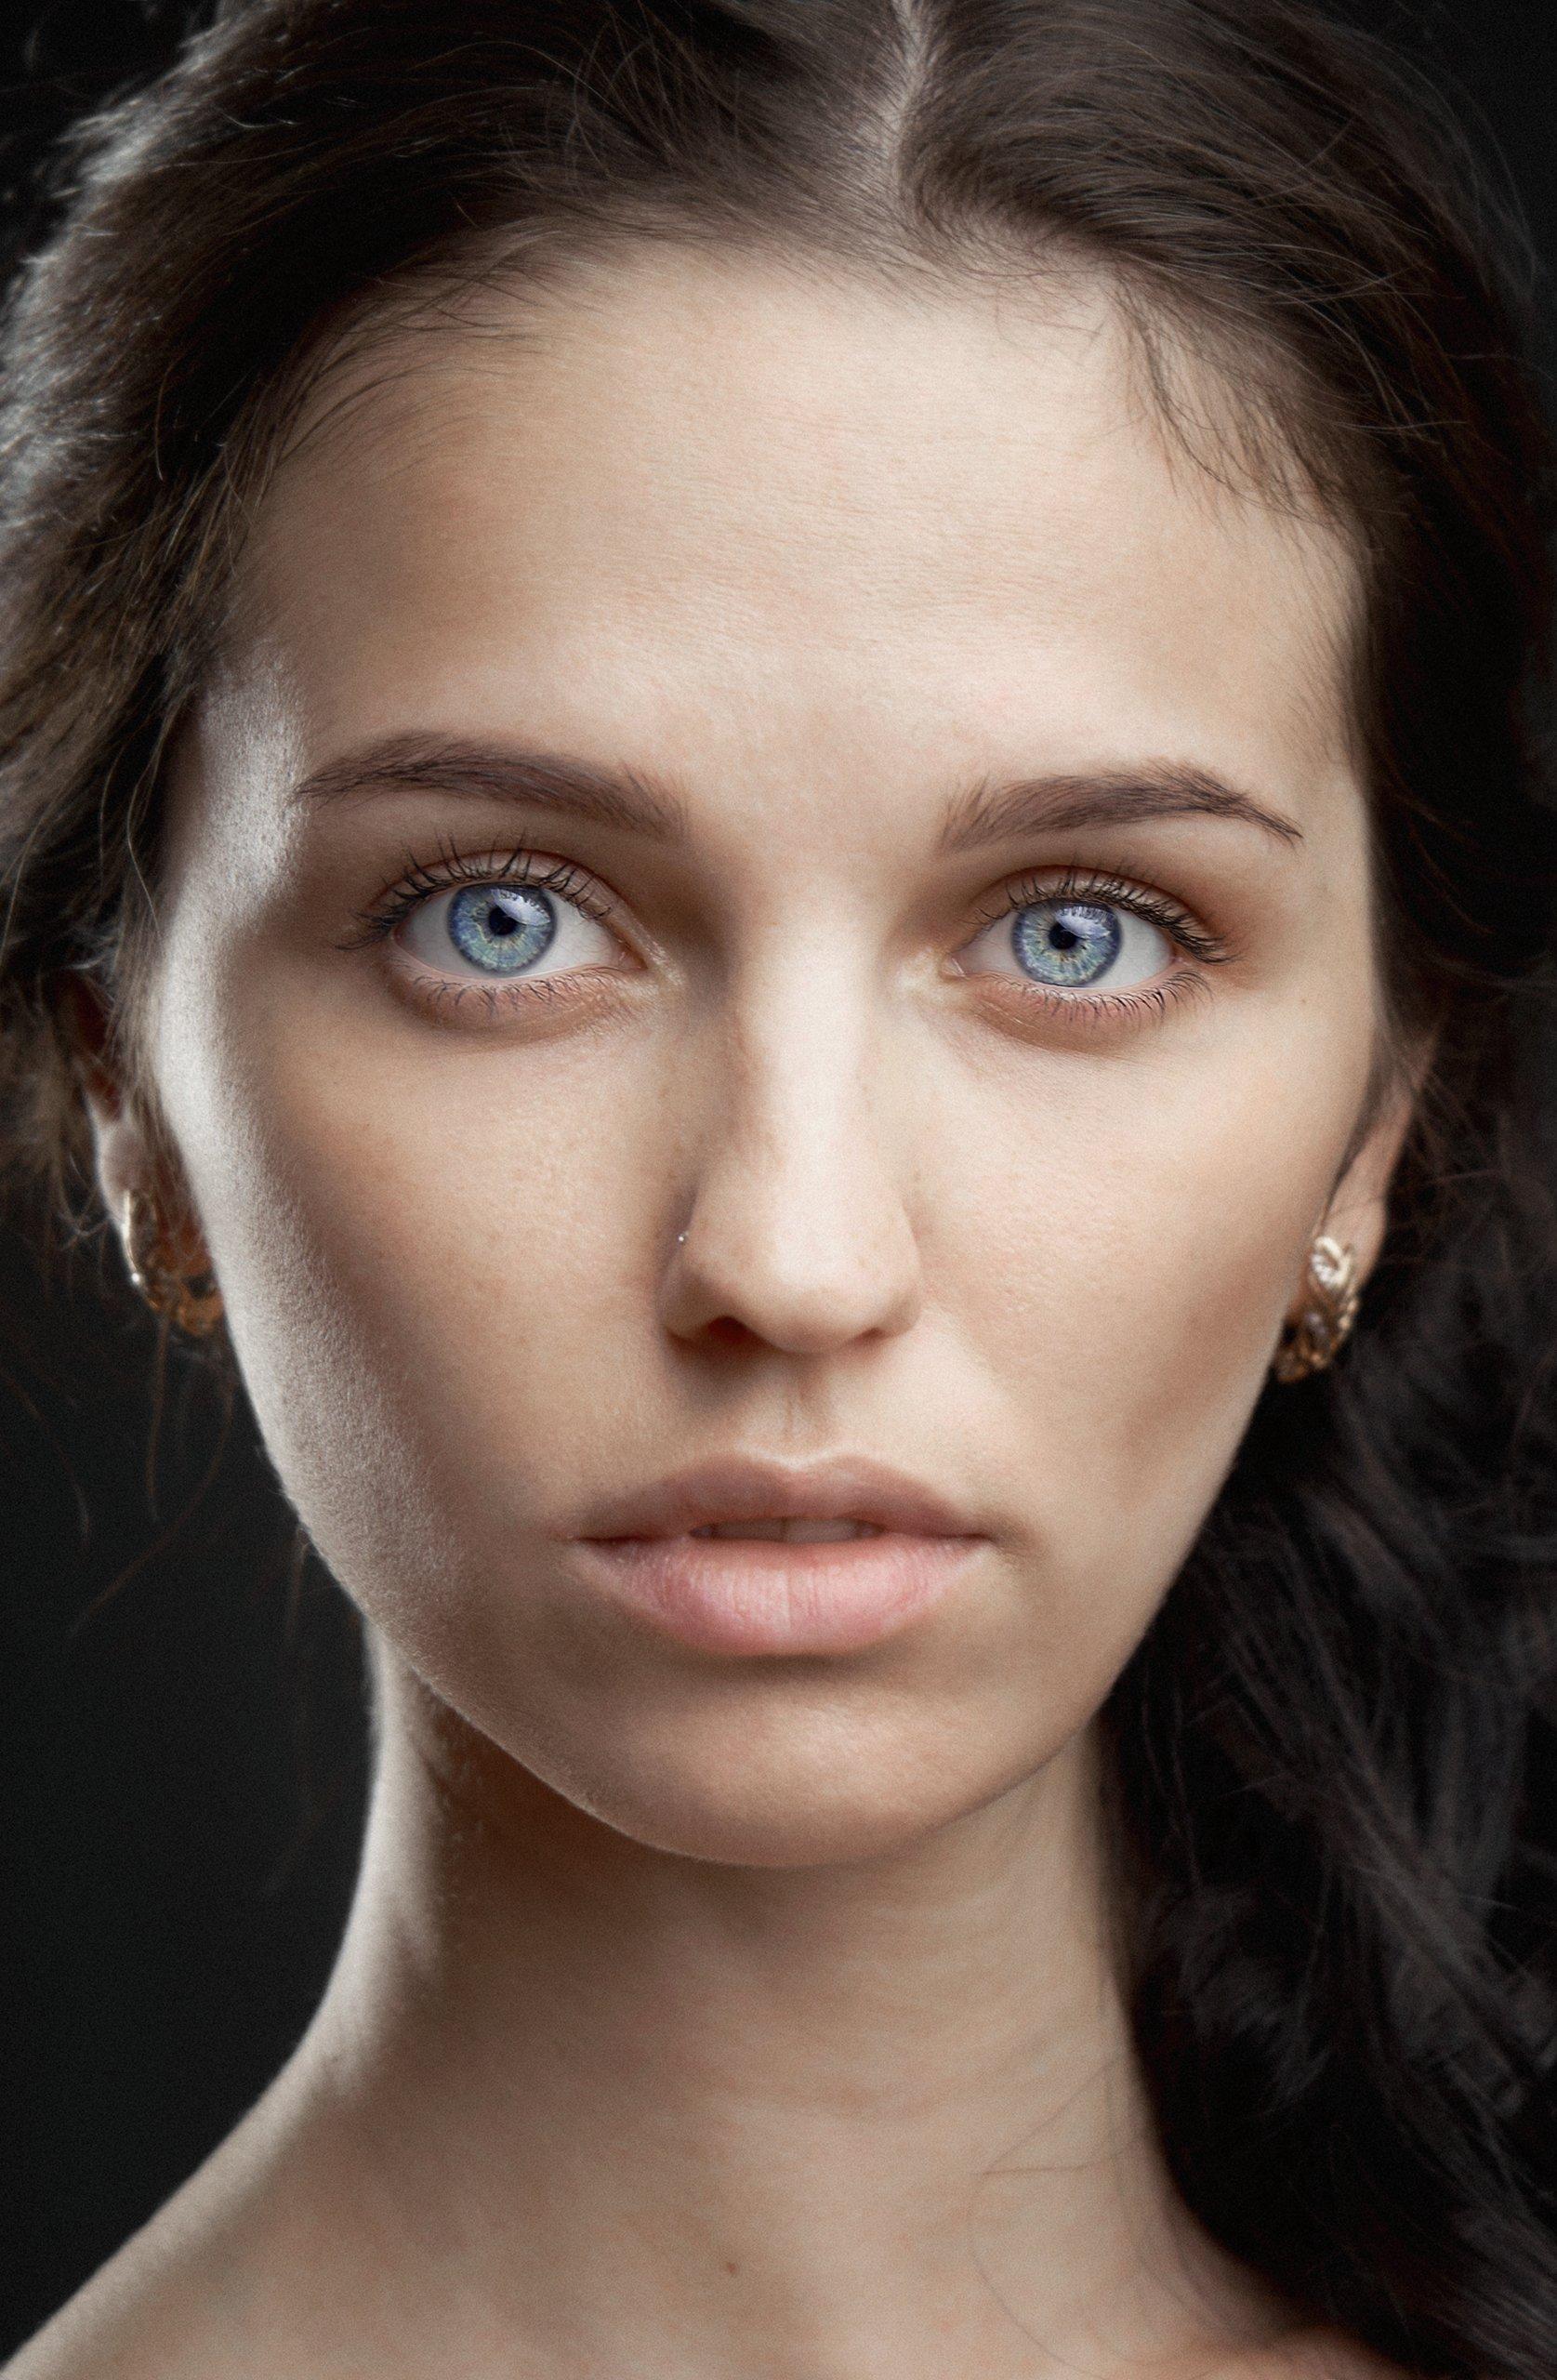 portait, model, girl, портрет, модель, девушка, арт, art, headshot portrait, headshot, Смотров Андрей